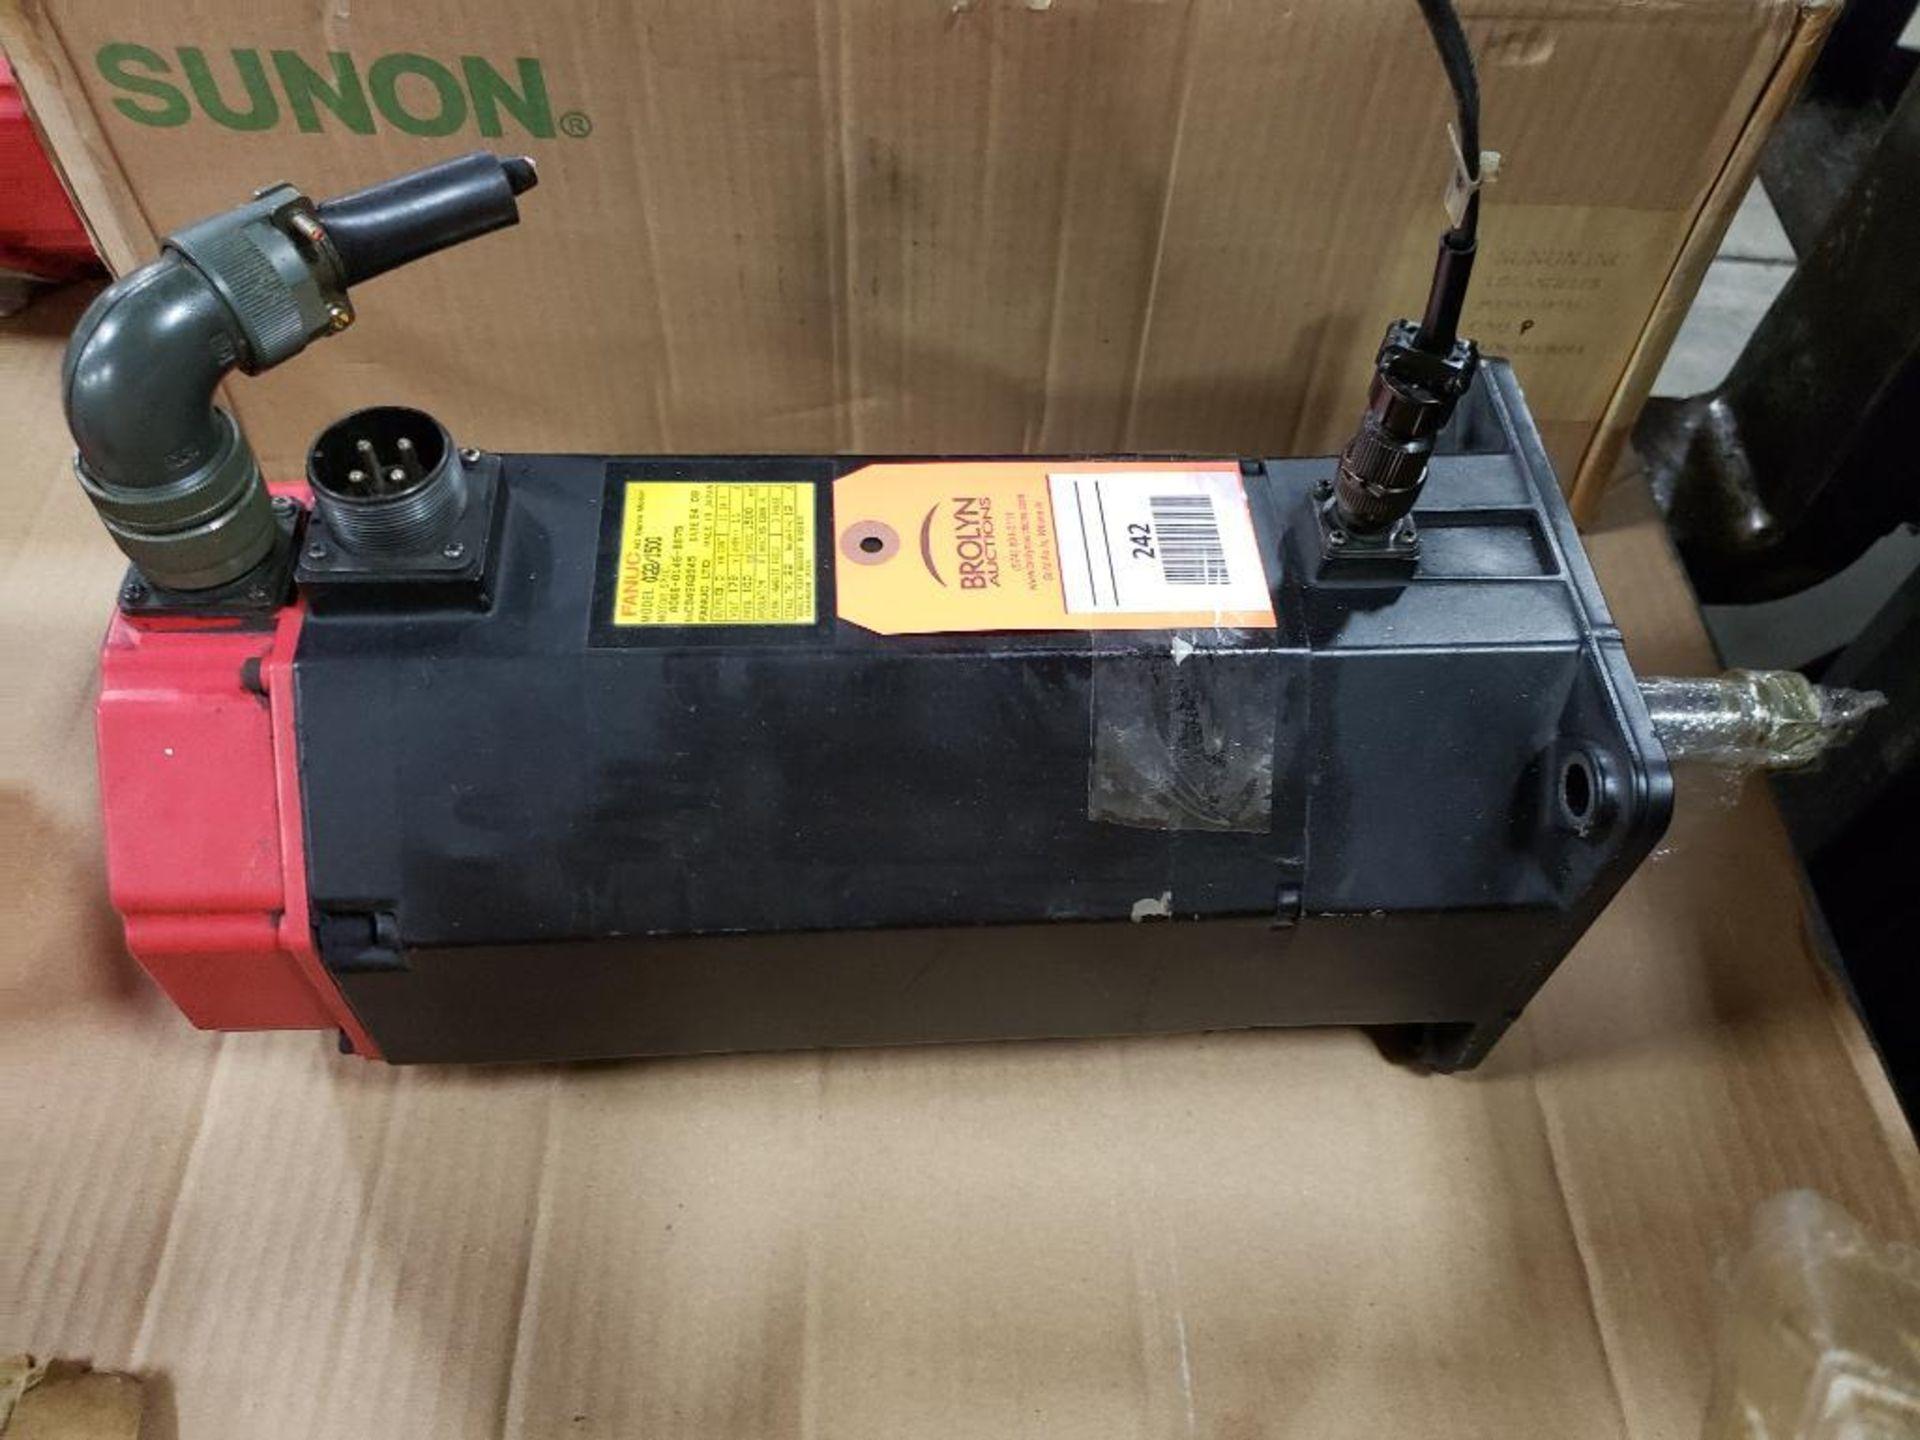 3.0kW GE Fanuc AC Servo Motor A06B-0146-B675. 179V, 1500RPM, 3PH.